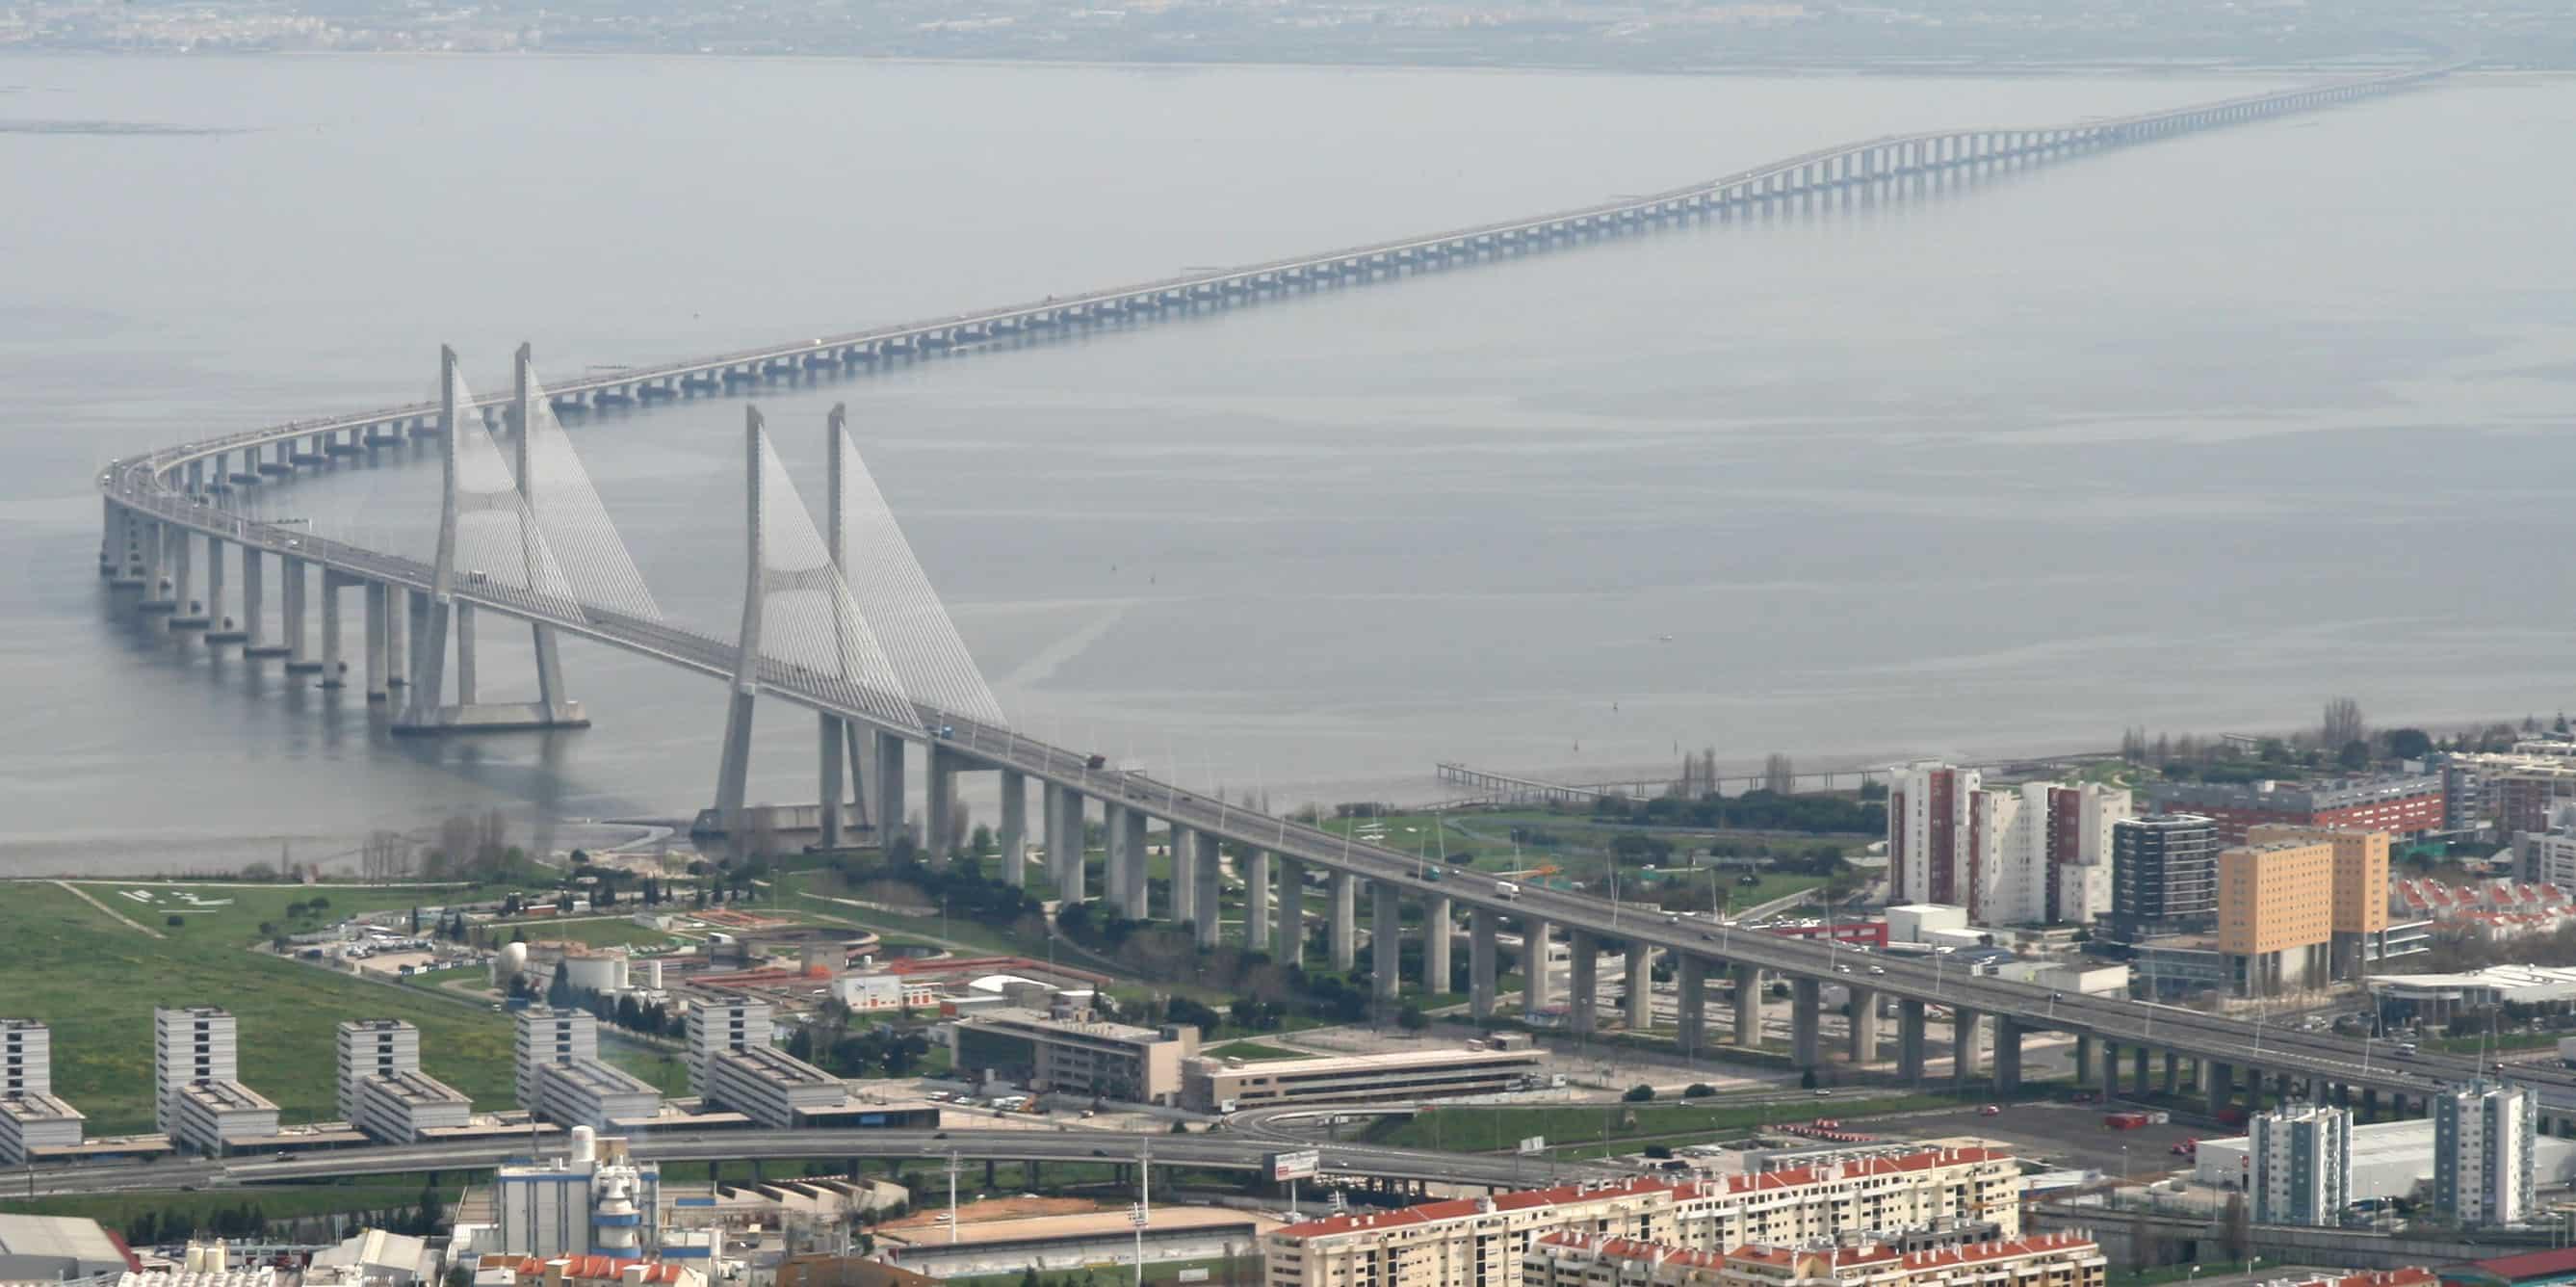 """Vasco da Gama Bridge aerial view"" by Till Niermann - Own work. Licensed under Creative Commons Attribution-Share Alike 3.0 via Wikimedia Commons - http://commons.wikimedia.org/wiki/File:Vasco_da_Gama_Bridge_aerial_view.jpg#mediaviewer/File:Vasco_da_Gama_Bridge_aerial_view.jpg"